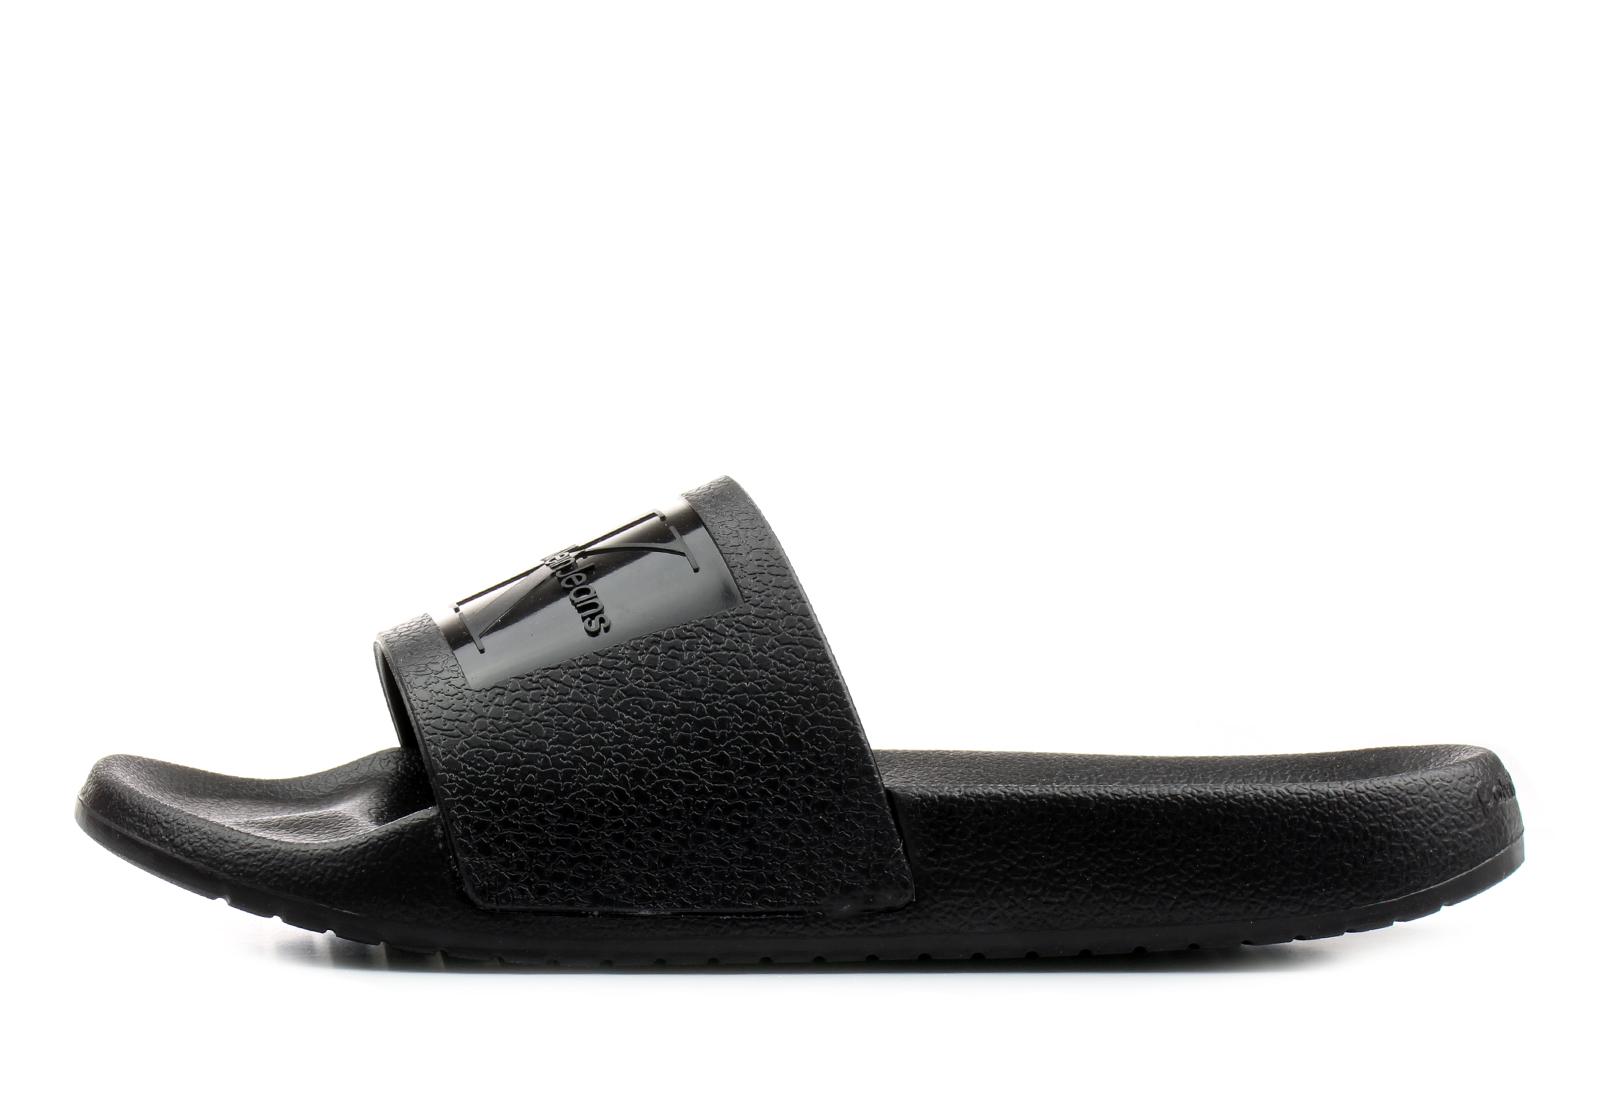 calvin klein jeans apky christie r8837 blk tenisky. Black Bedroom Furniture Sets. Home Design Ideas